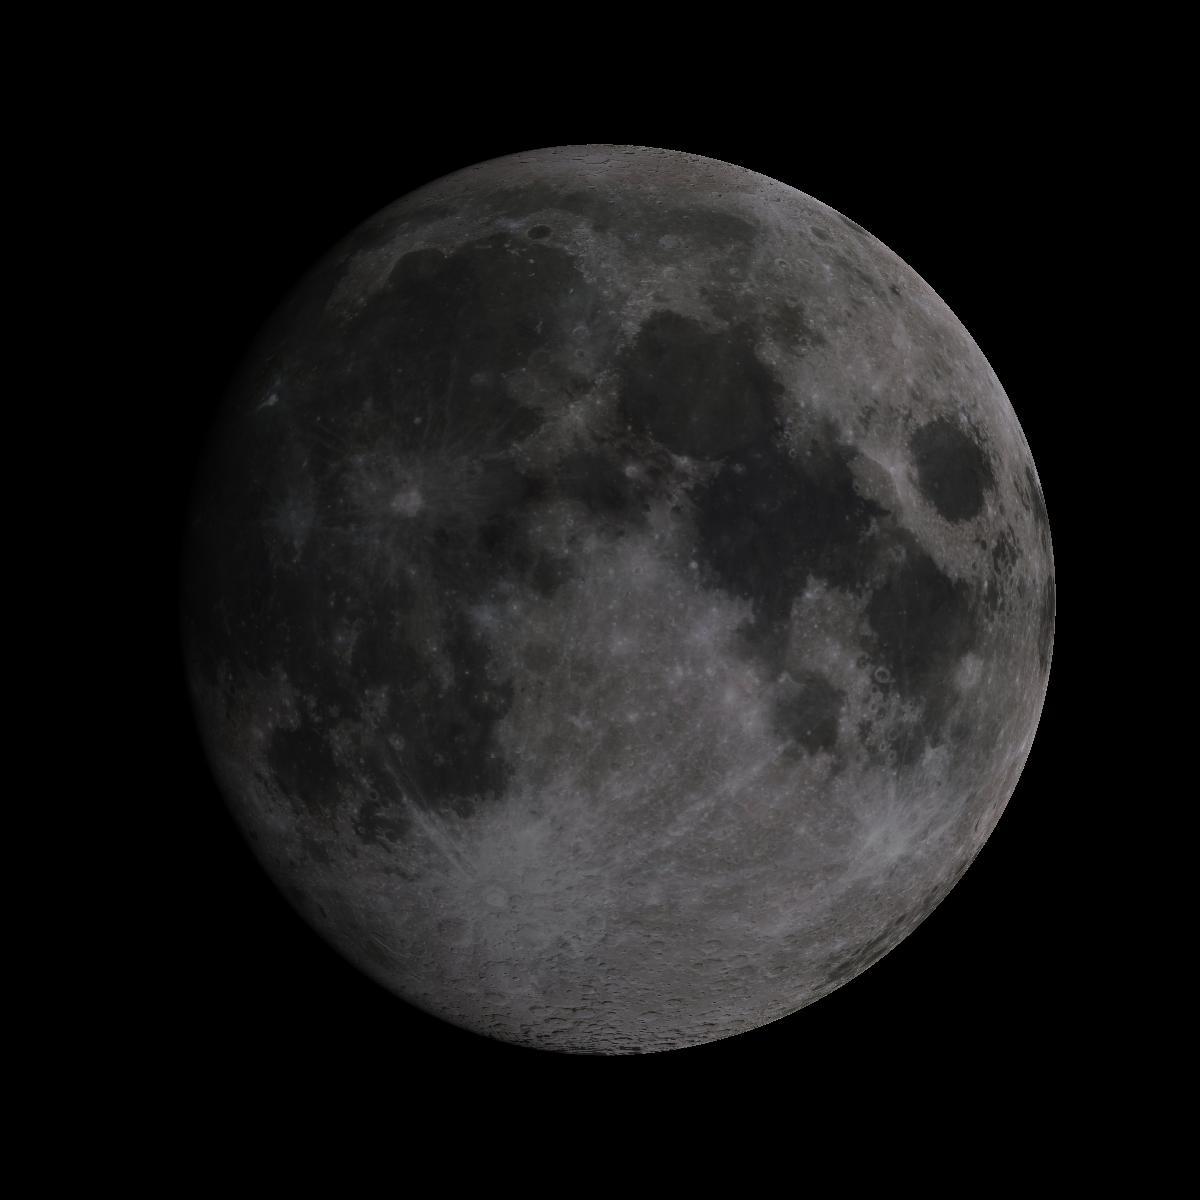 Lune du 15 juillet 2019